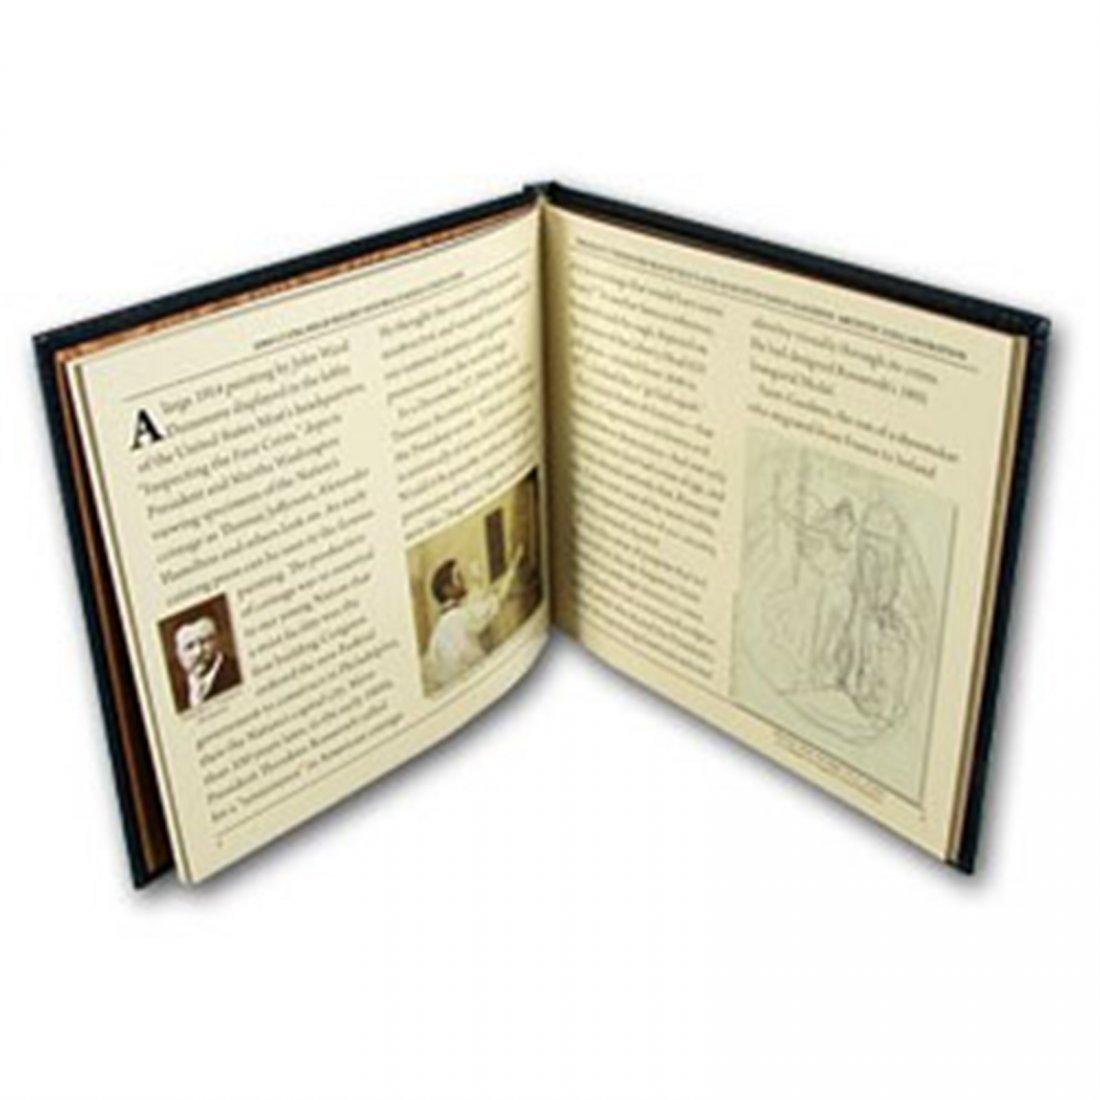 2009 Ultra High Relief Double Eagle Gold Coin Book - 2